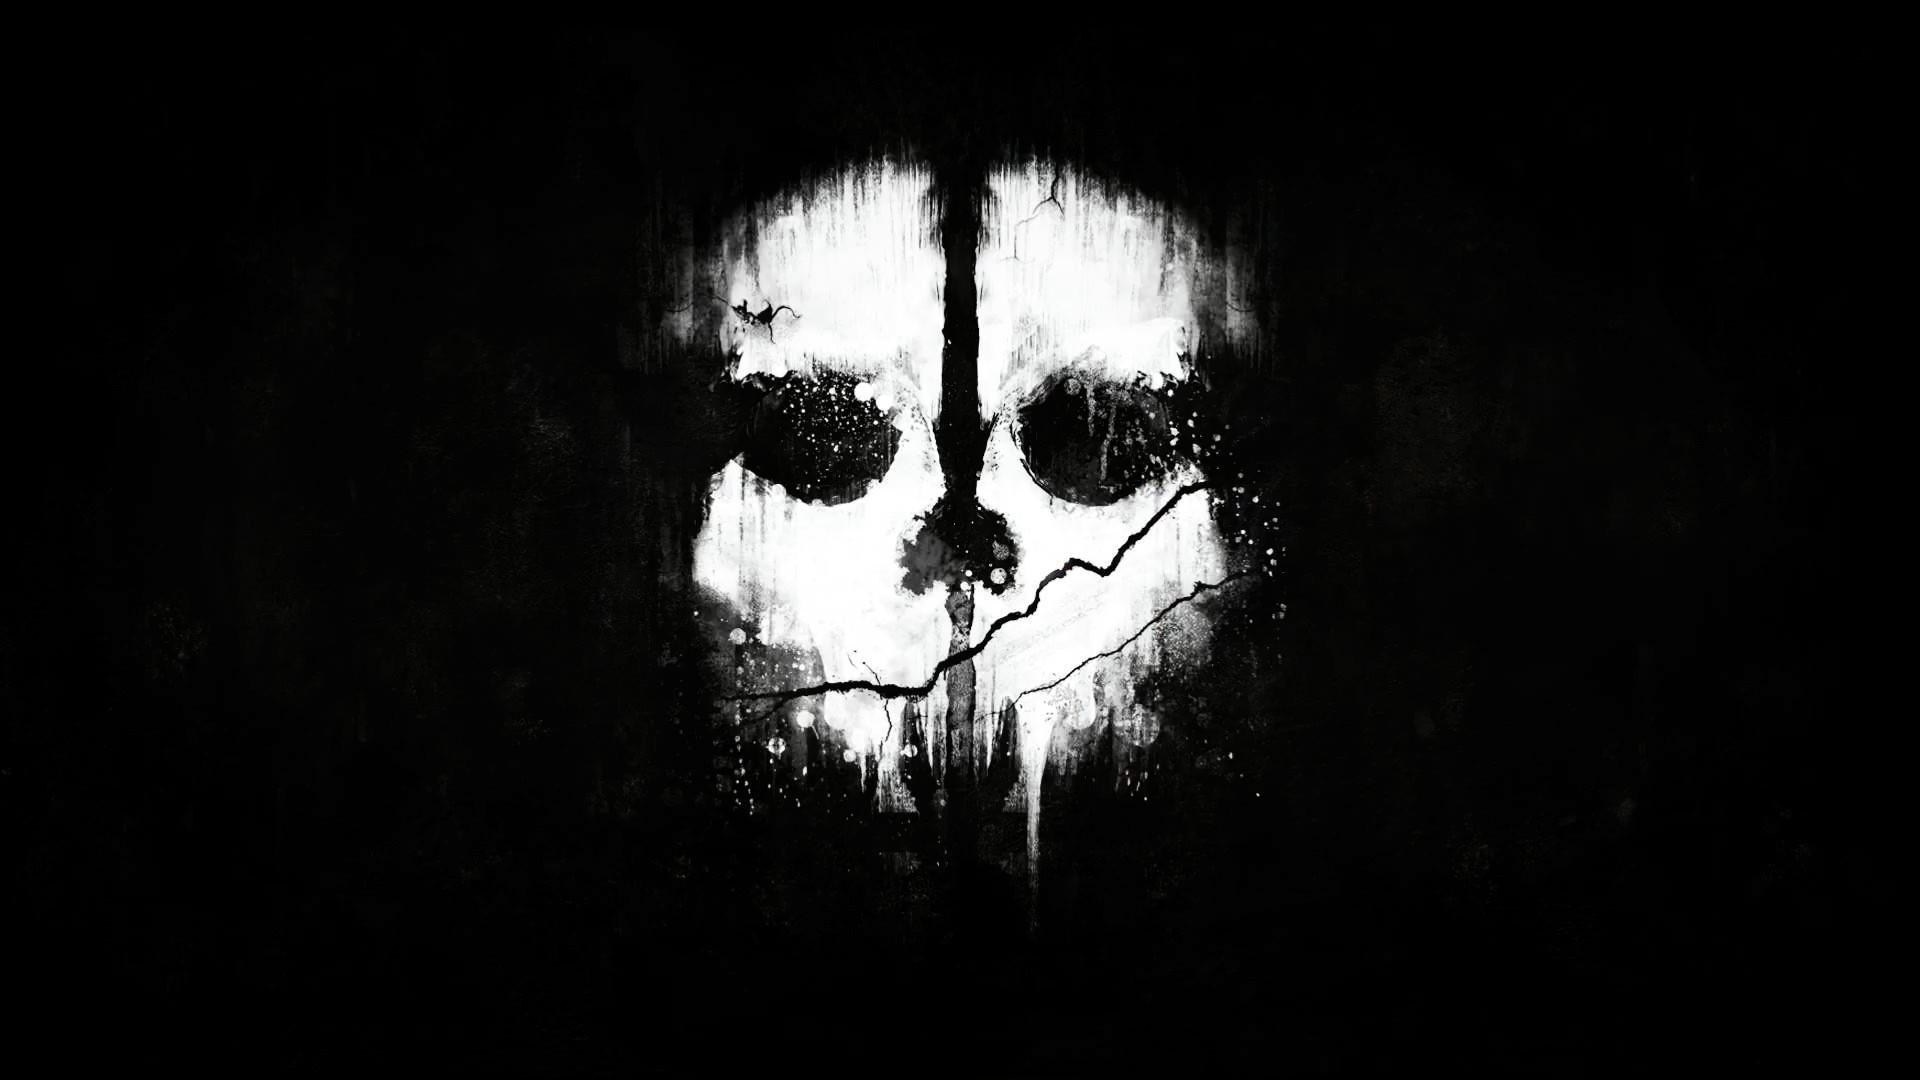 call of duty ghosts desktop wallpaper 1920×1080